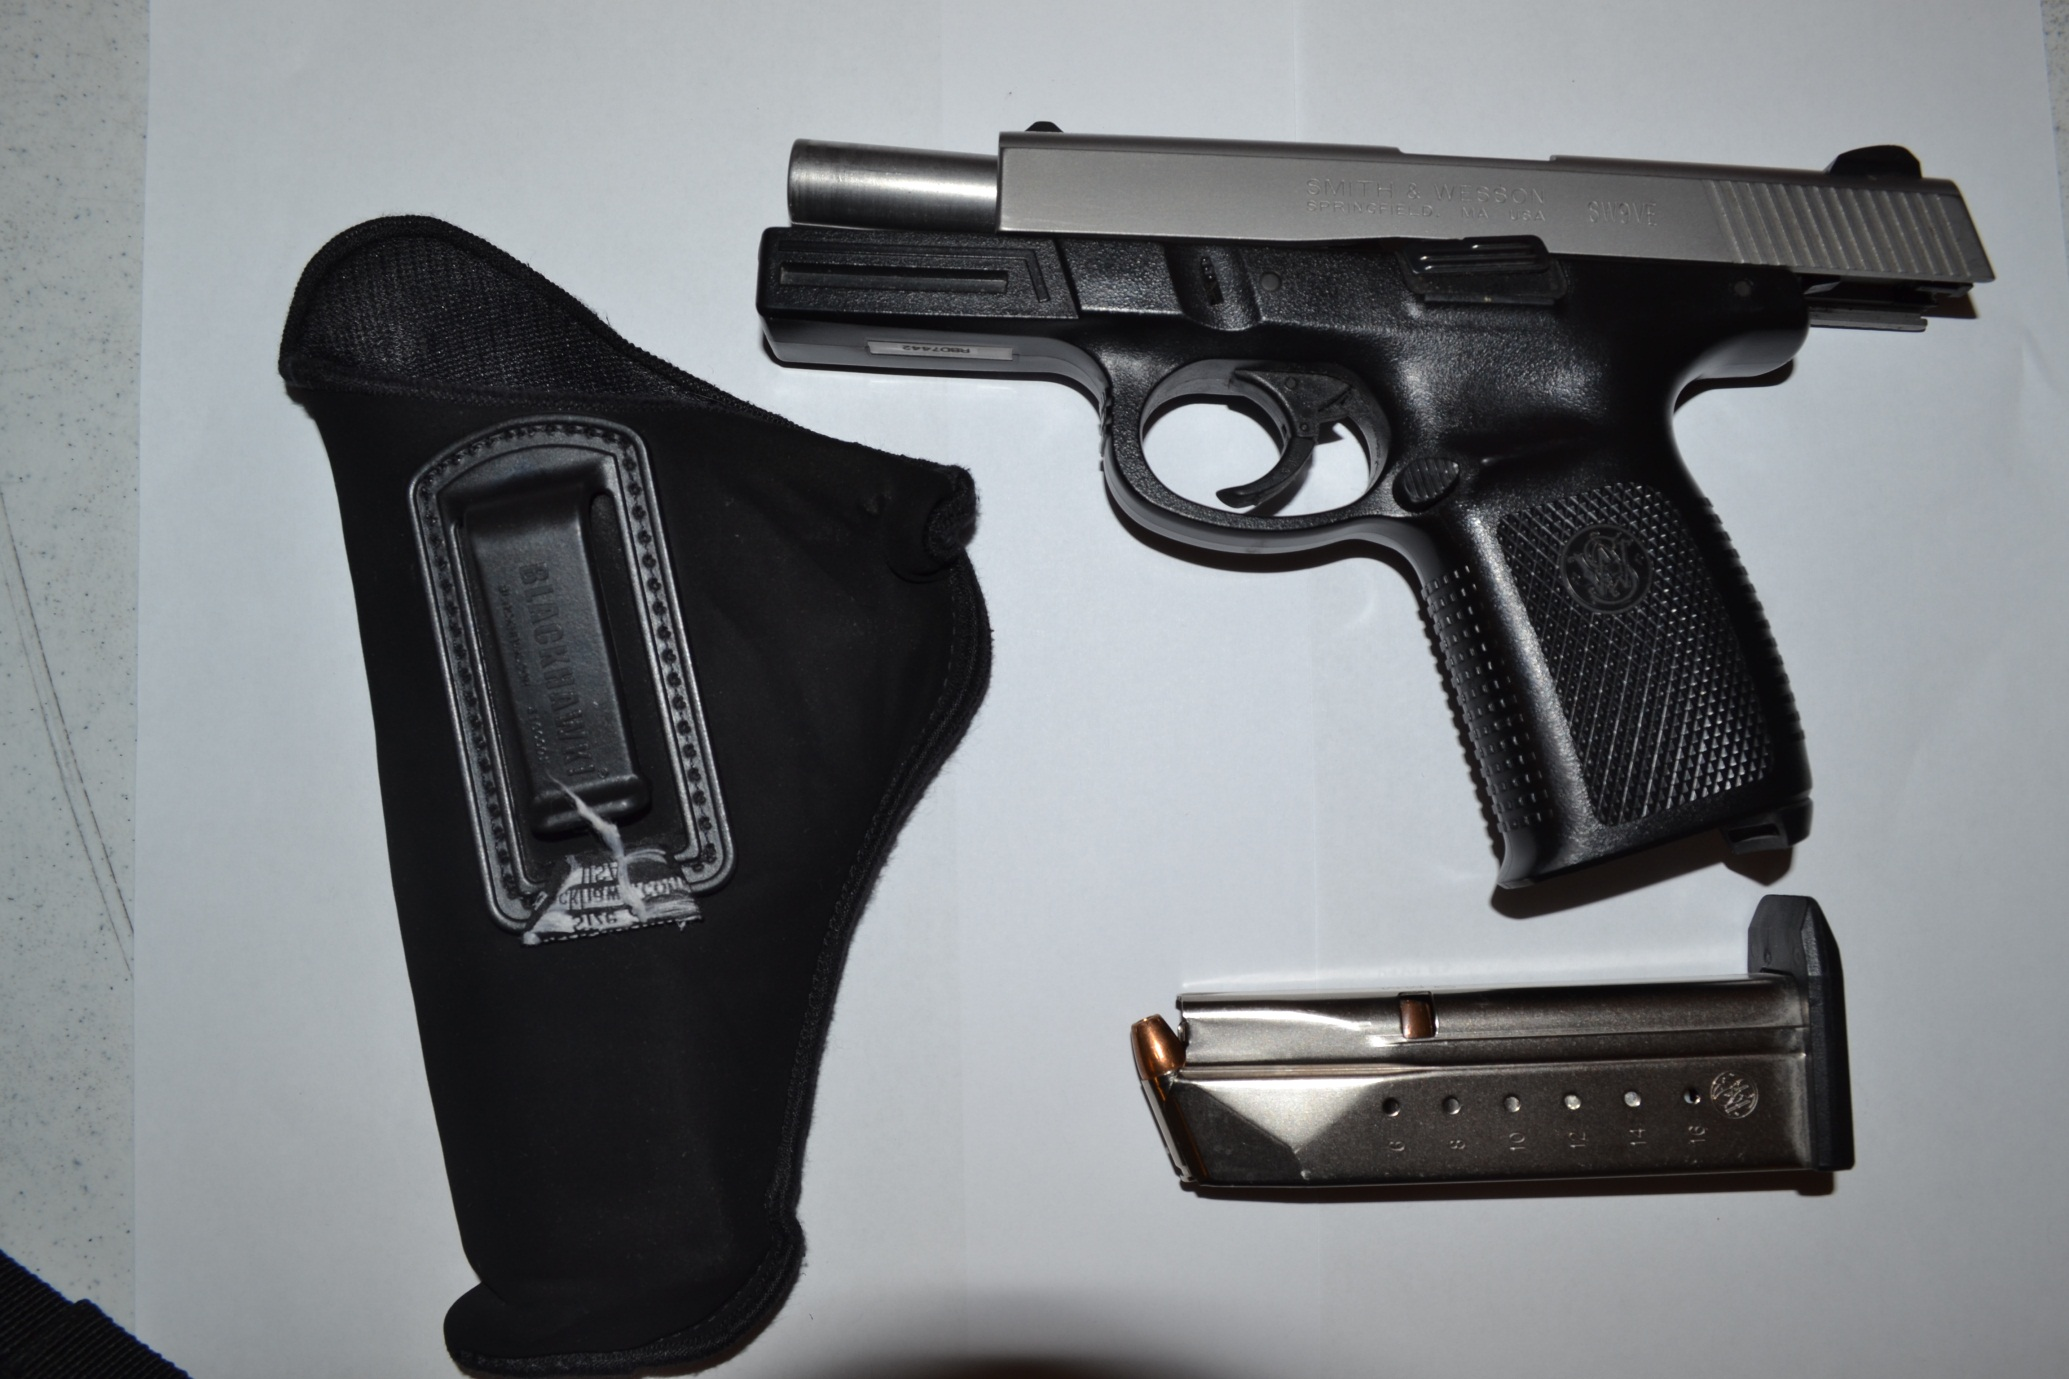 Suicide prevention campaign targets gun stores_101367